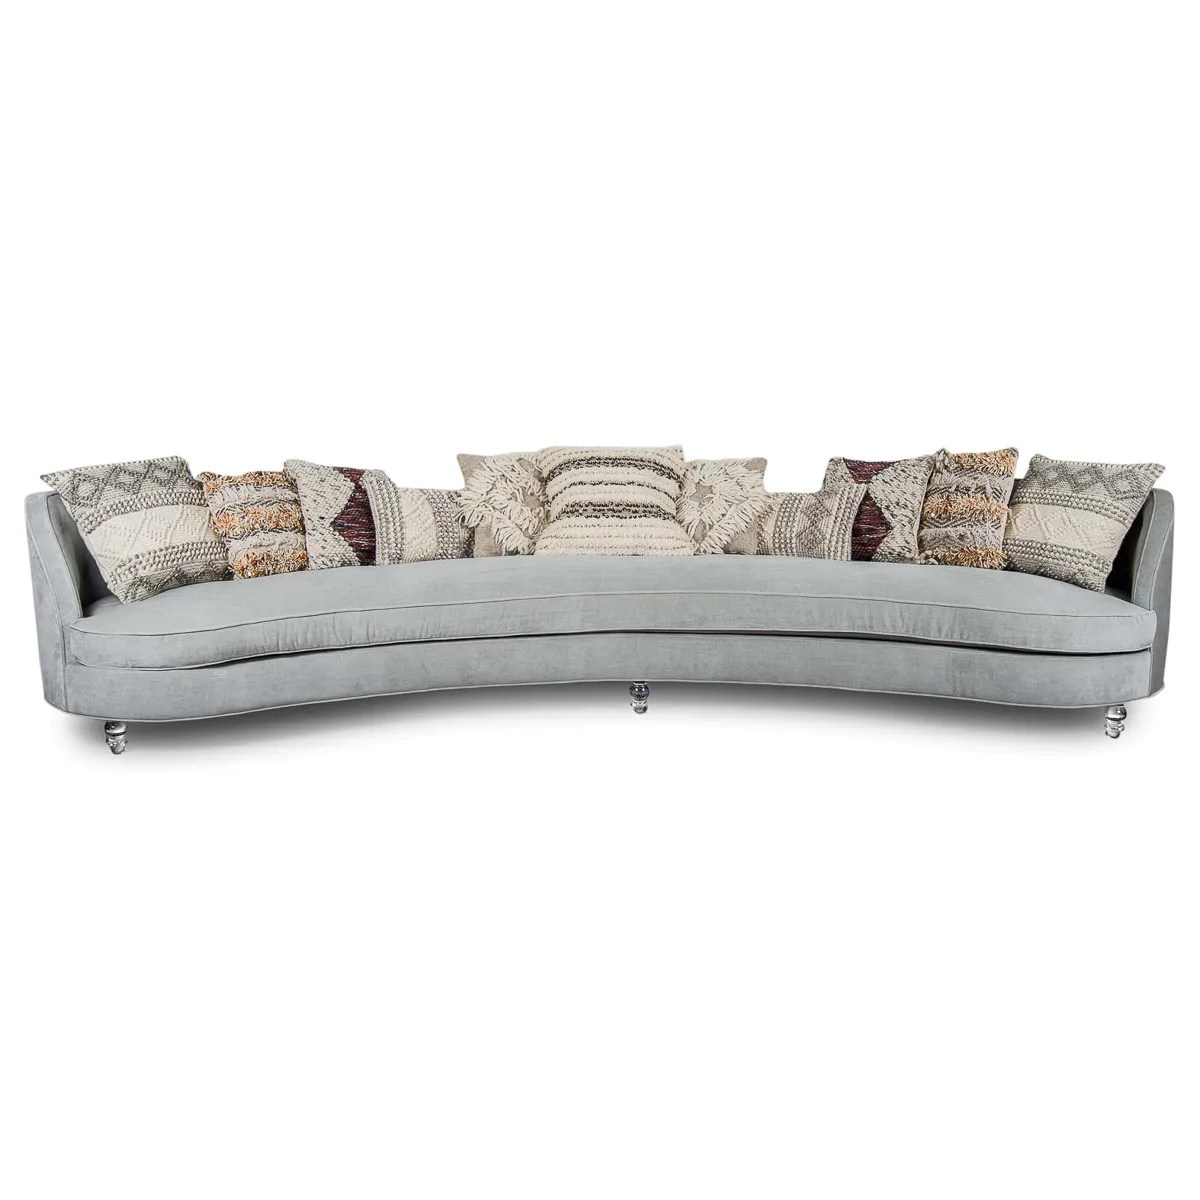 Saint Tropez Curved Sofa  Charcoal Velvet Upholstery